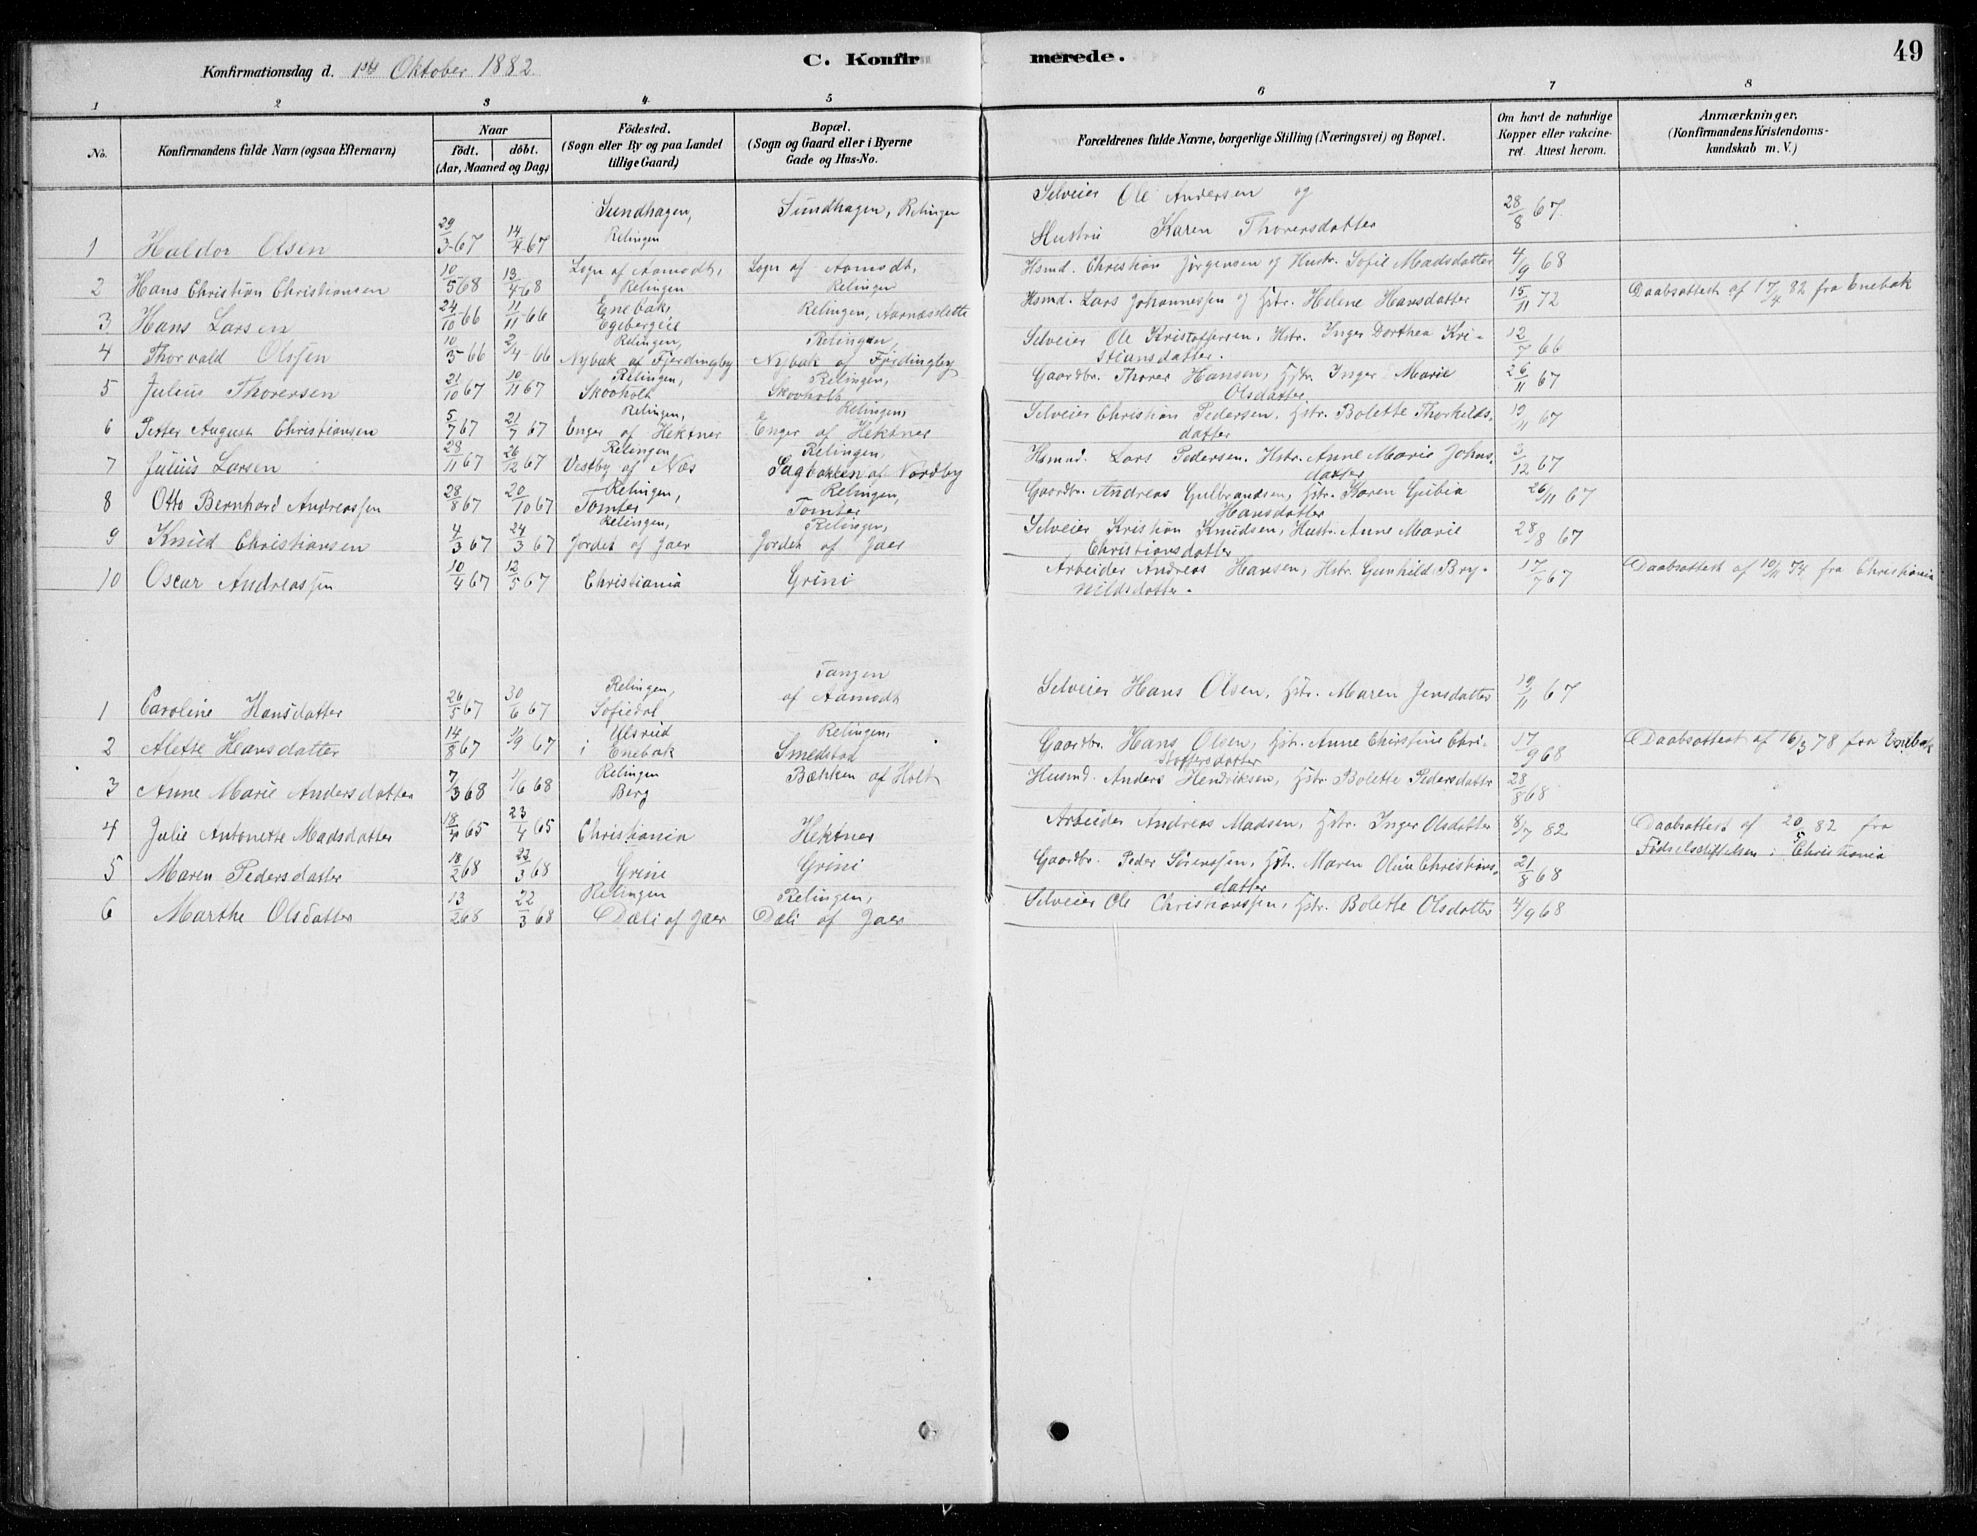 SAO, Fet prestekontor Kirkebøker, G/Gb/L0002: Klokkerbok nr. II 2, 1878-1911, s. 49